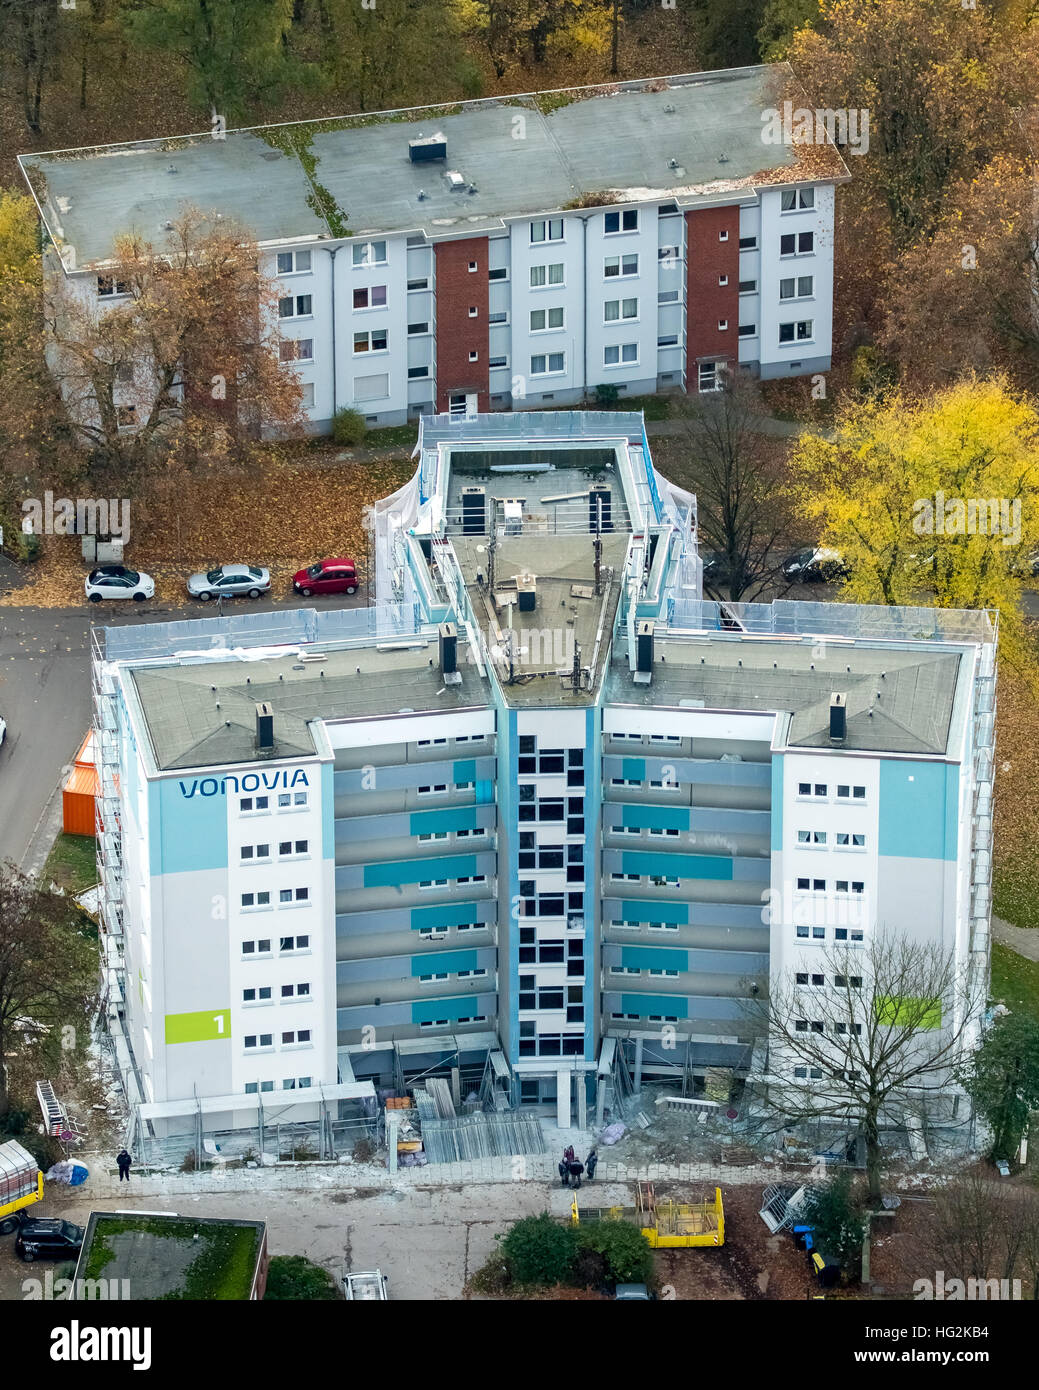 Aerial view, renovations VONOVIA skyscraper and settlement Narcissus Road, social housing, rental housing, Bochum, - Stock Image